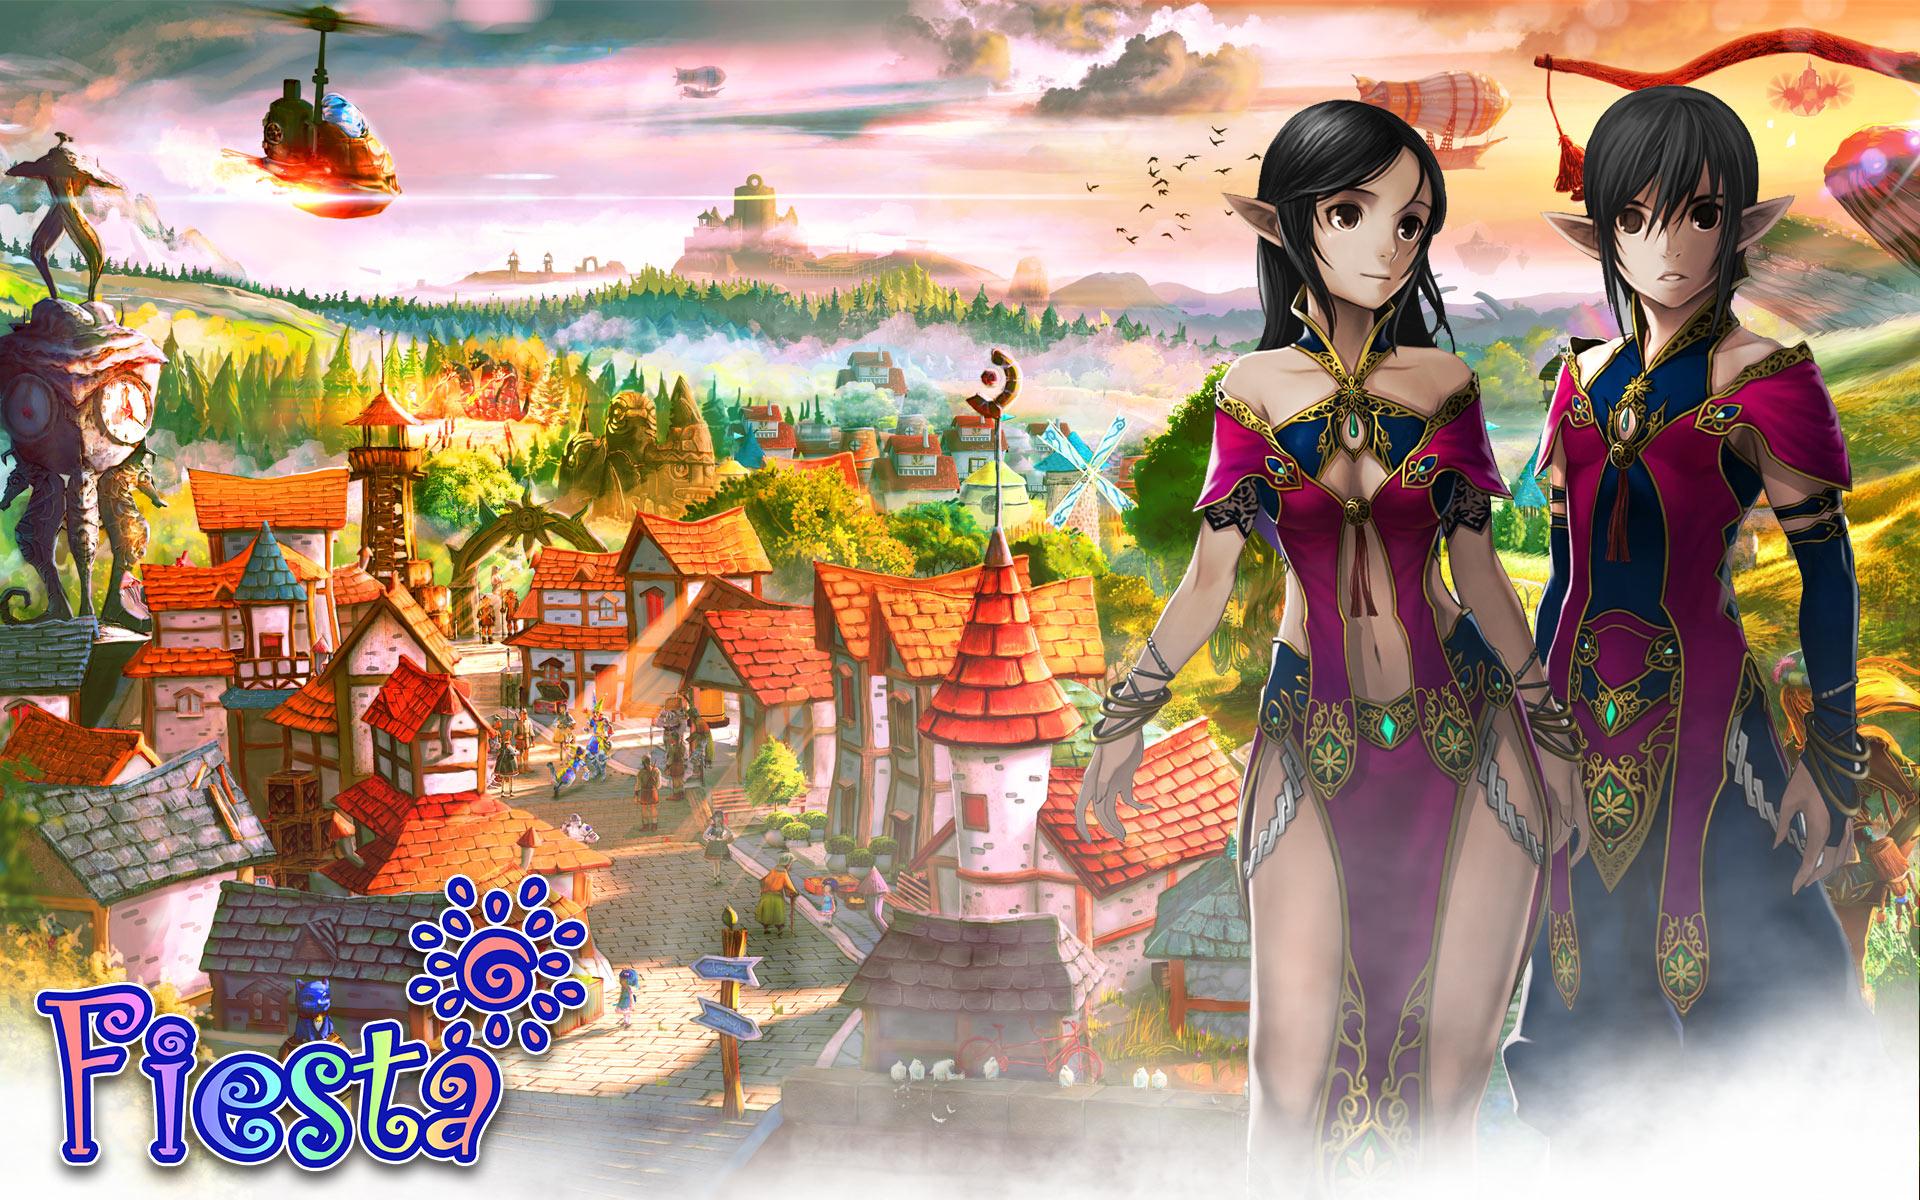 Wallpaper 3d Facebook Media Trailers Fiesta Online 3d Anime Mmorpg